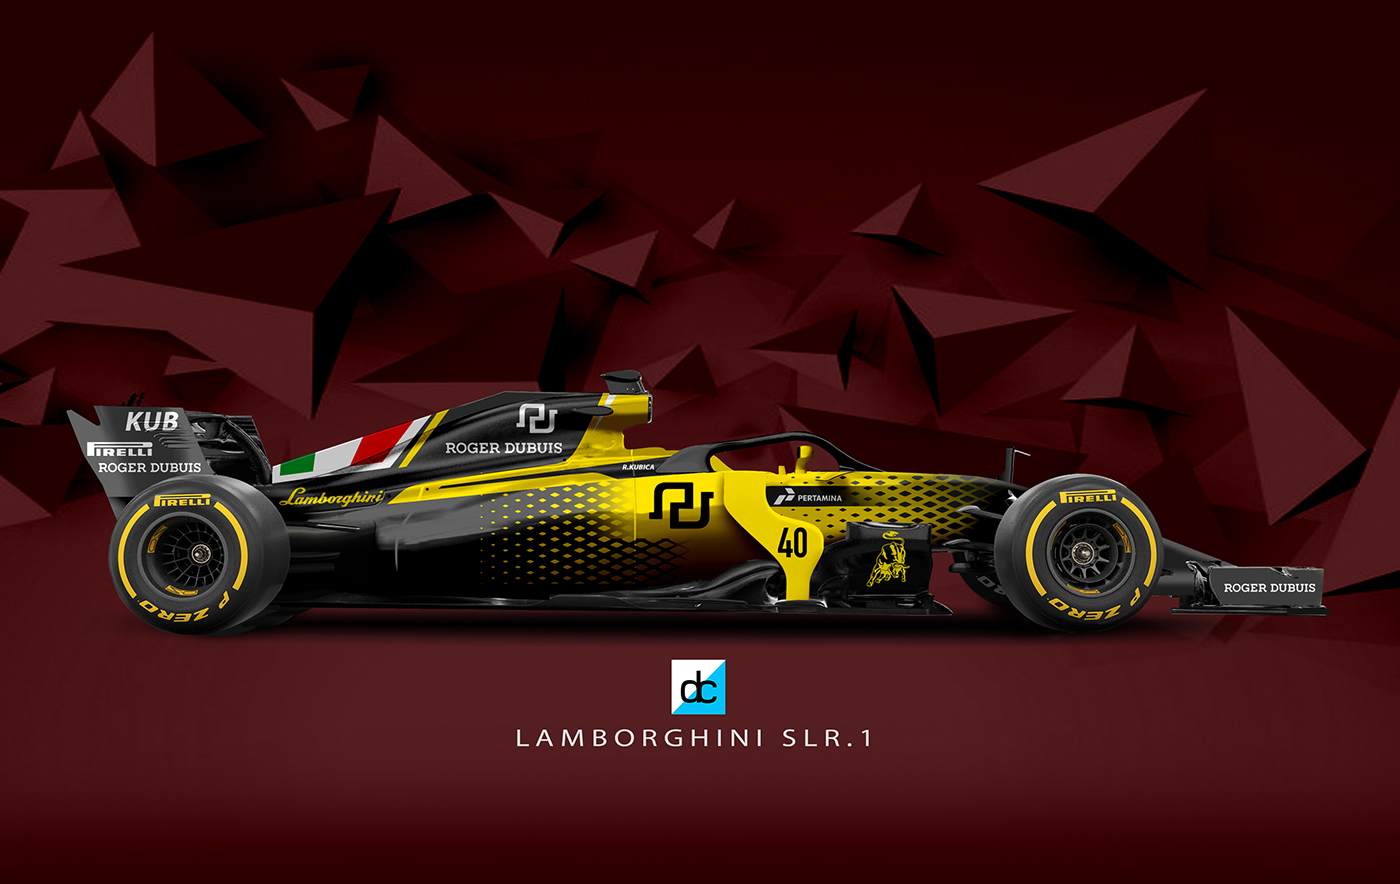 Lamborghini Racing F1 Team Concept Late Braking On Behance